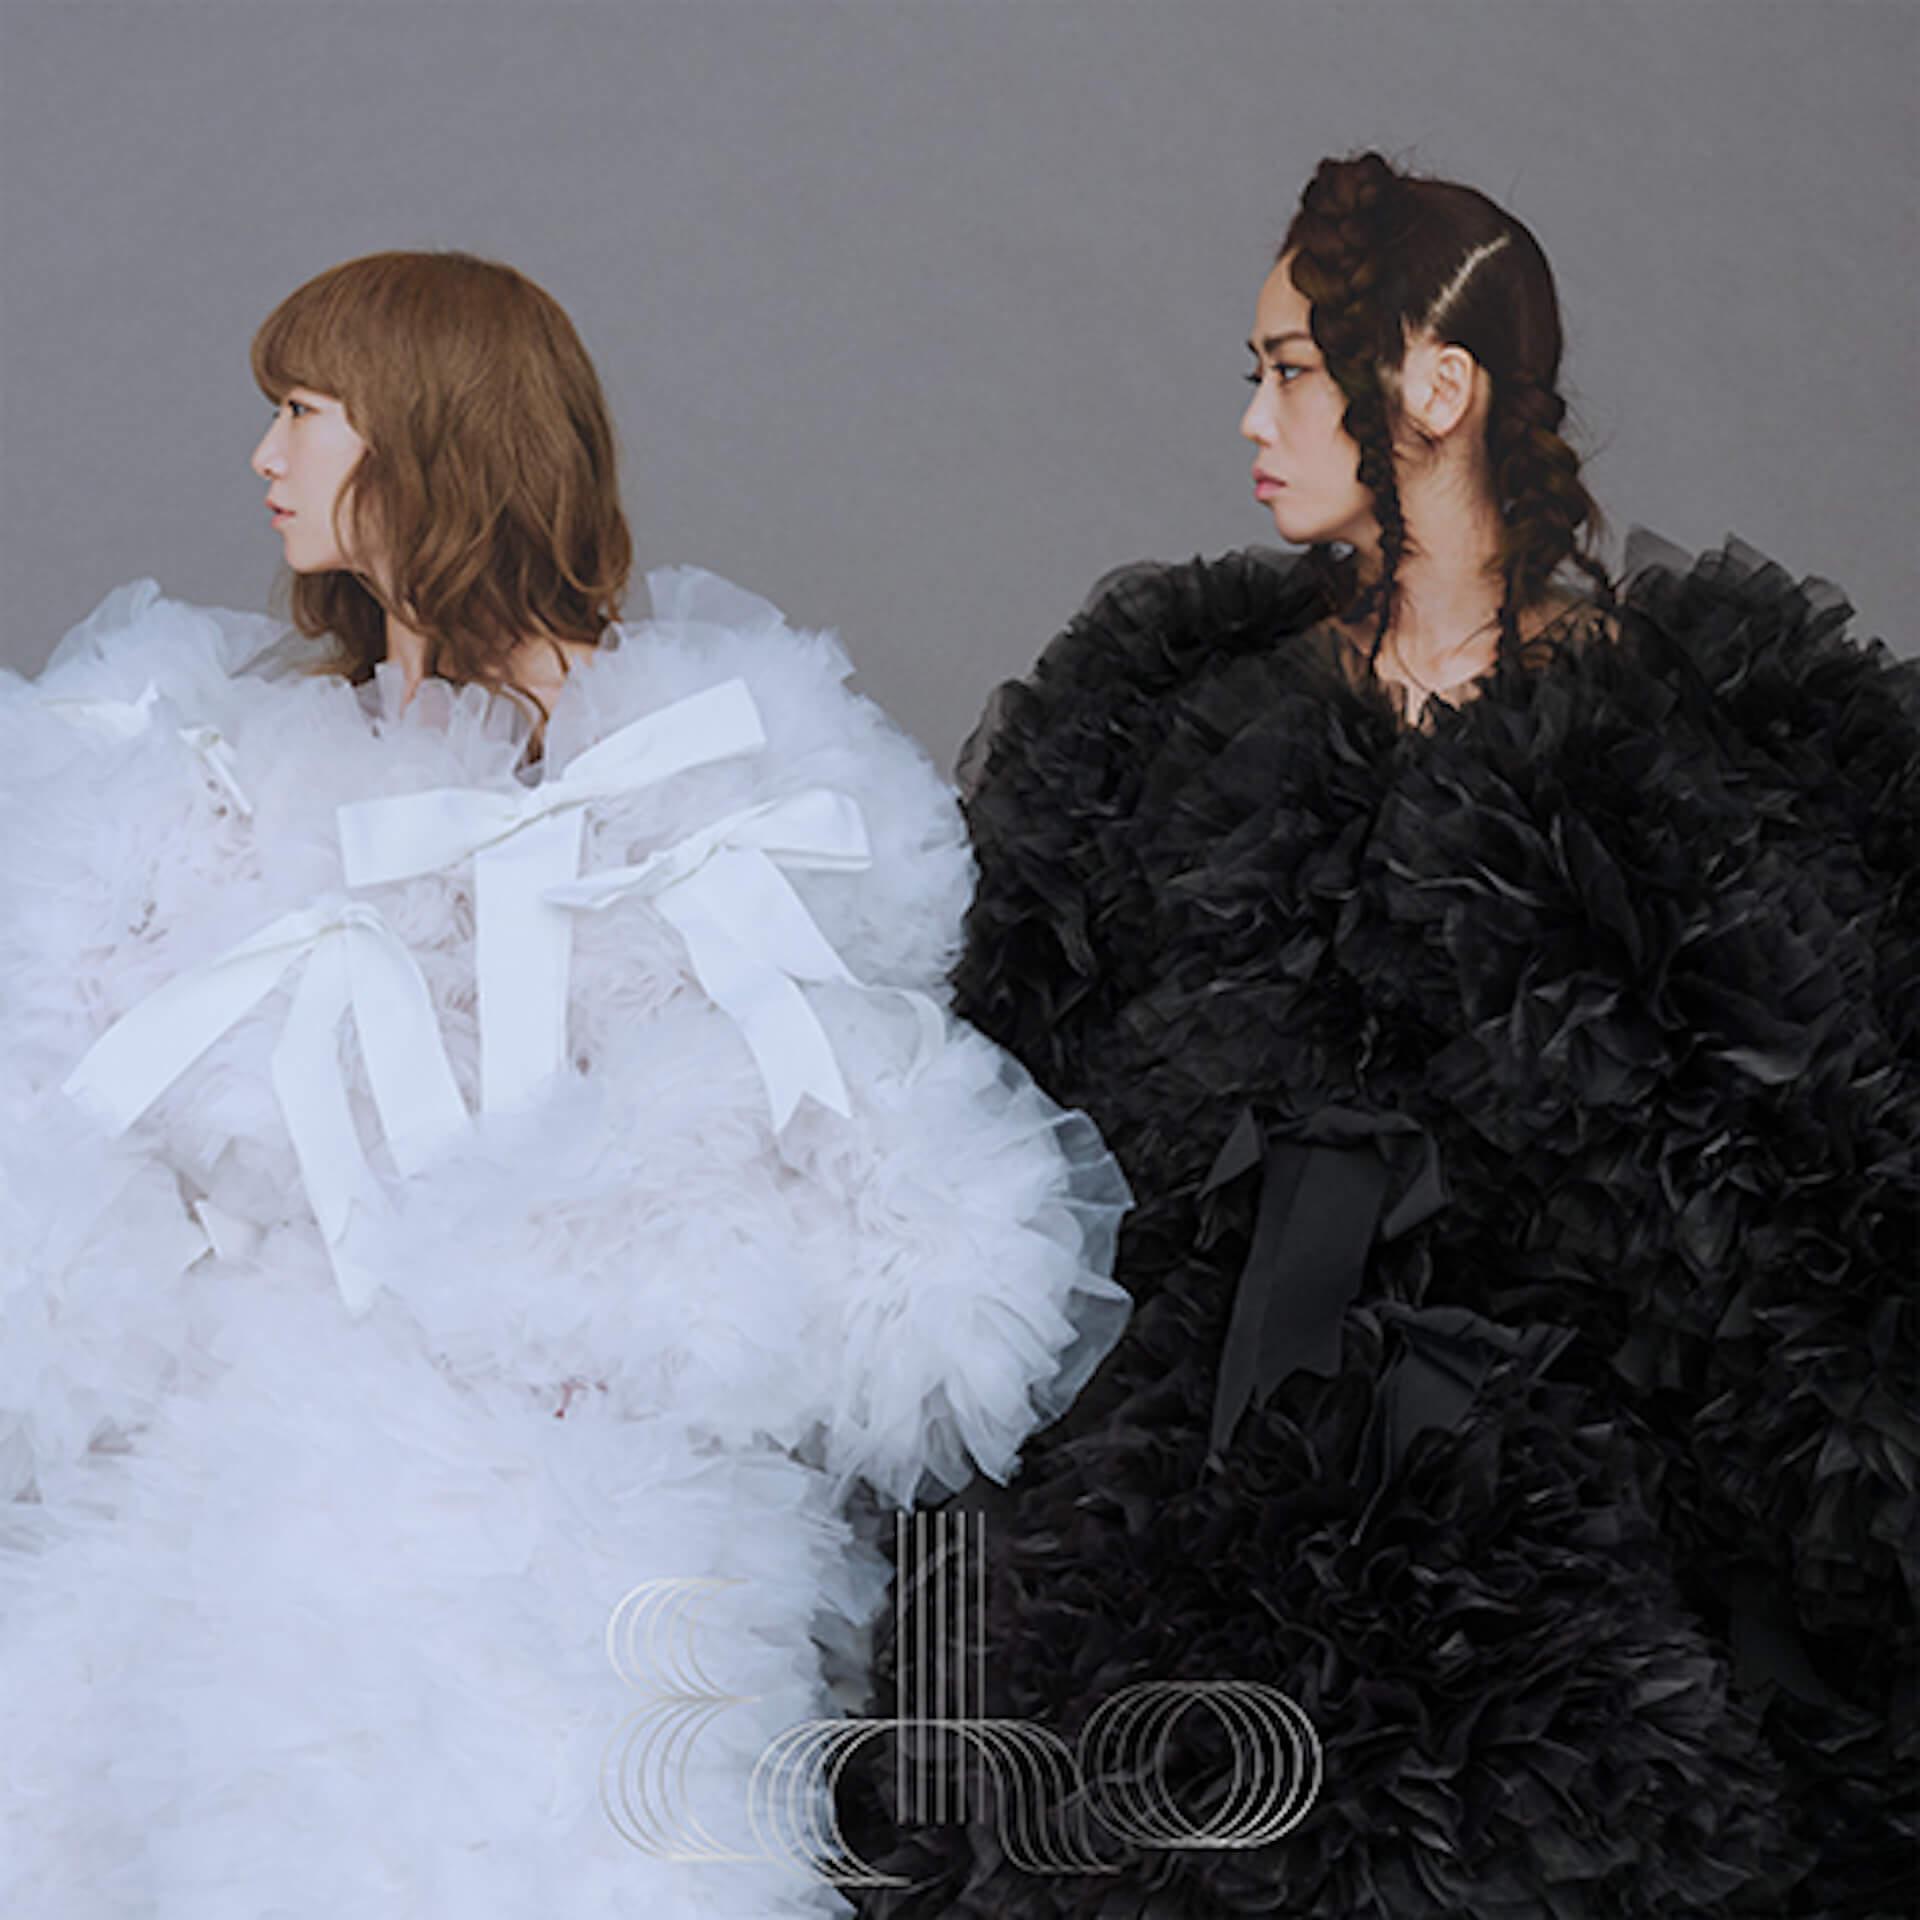 Chara+YUKI、新シングル&ミニアルバムのジャケット写真&収録曲が決定!オフィシャルサイトにはふたりのインタビューも music200110_charayuki_2